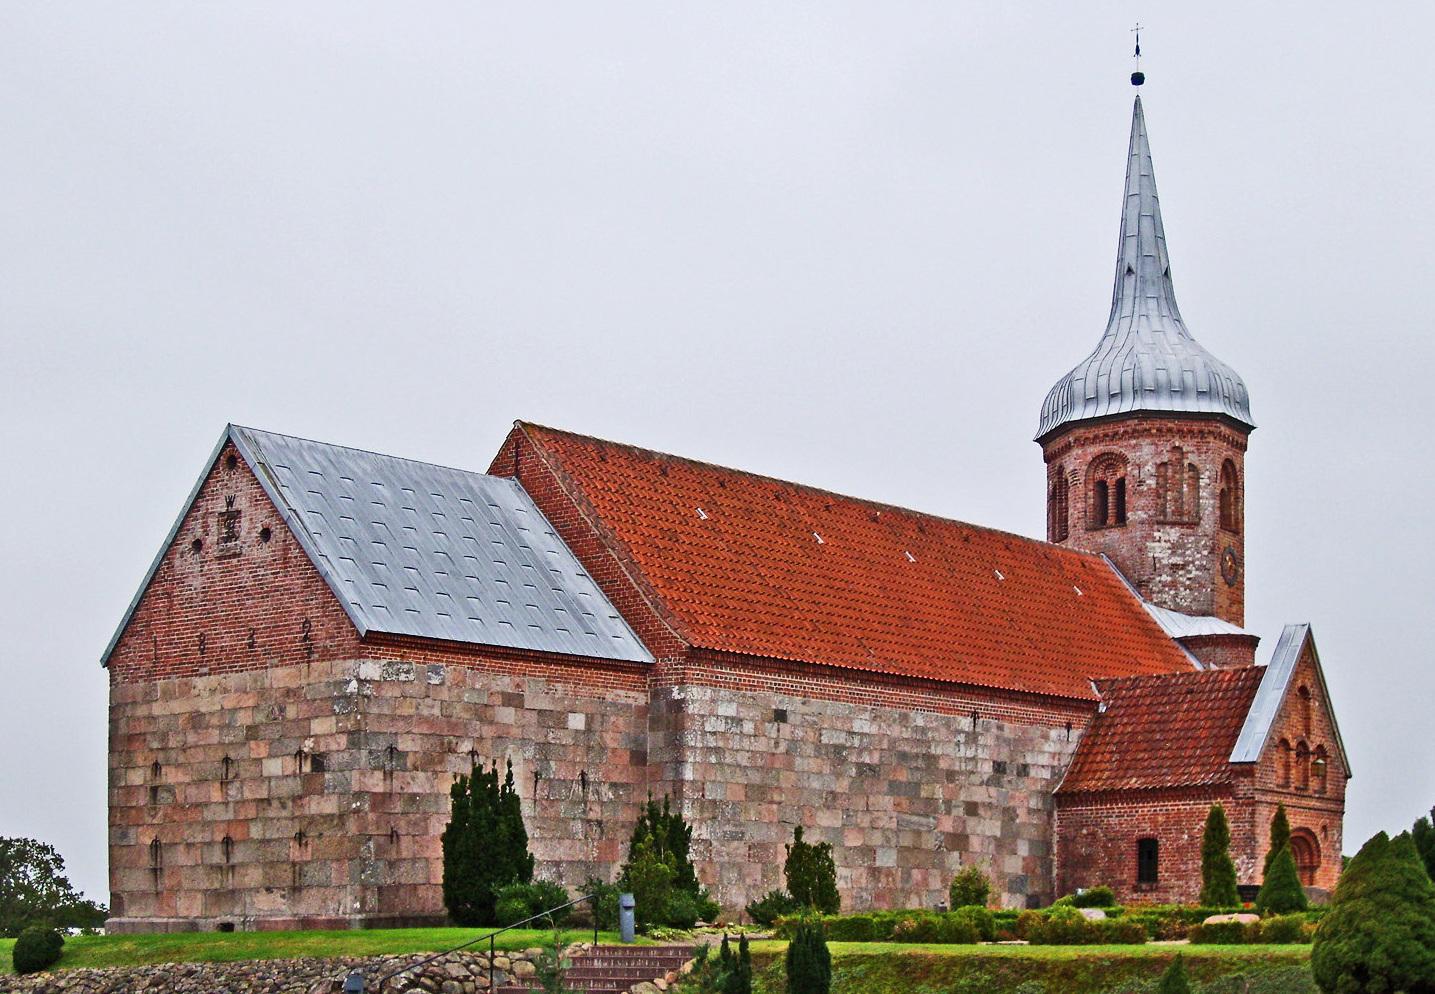 Dating sites danmark Roskilde